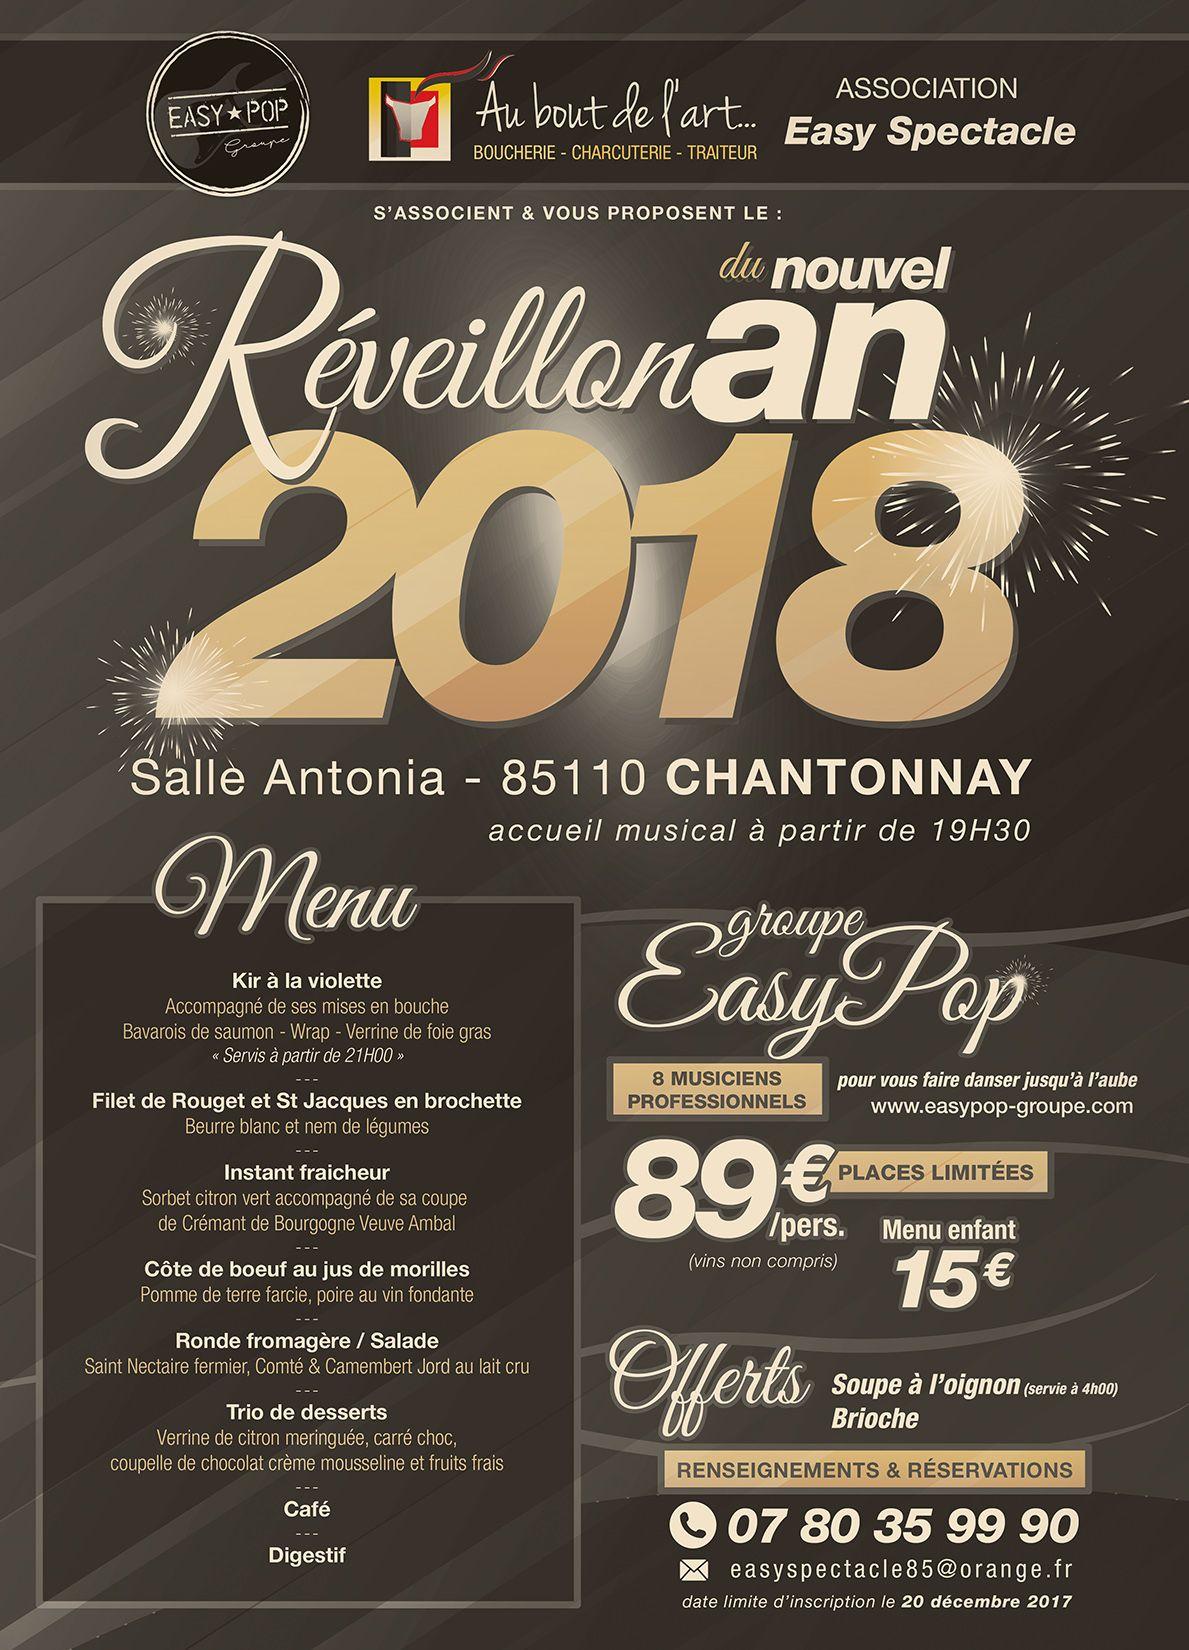 Reveillon Du Nouvel An 2018 Chantonnay